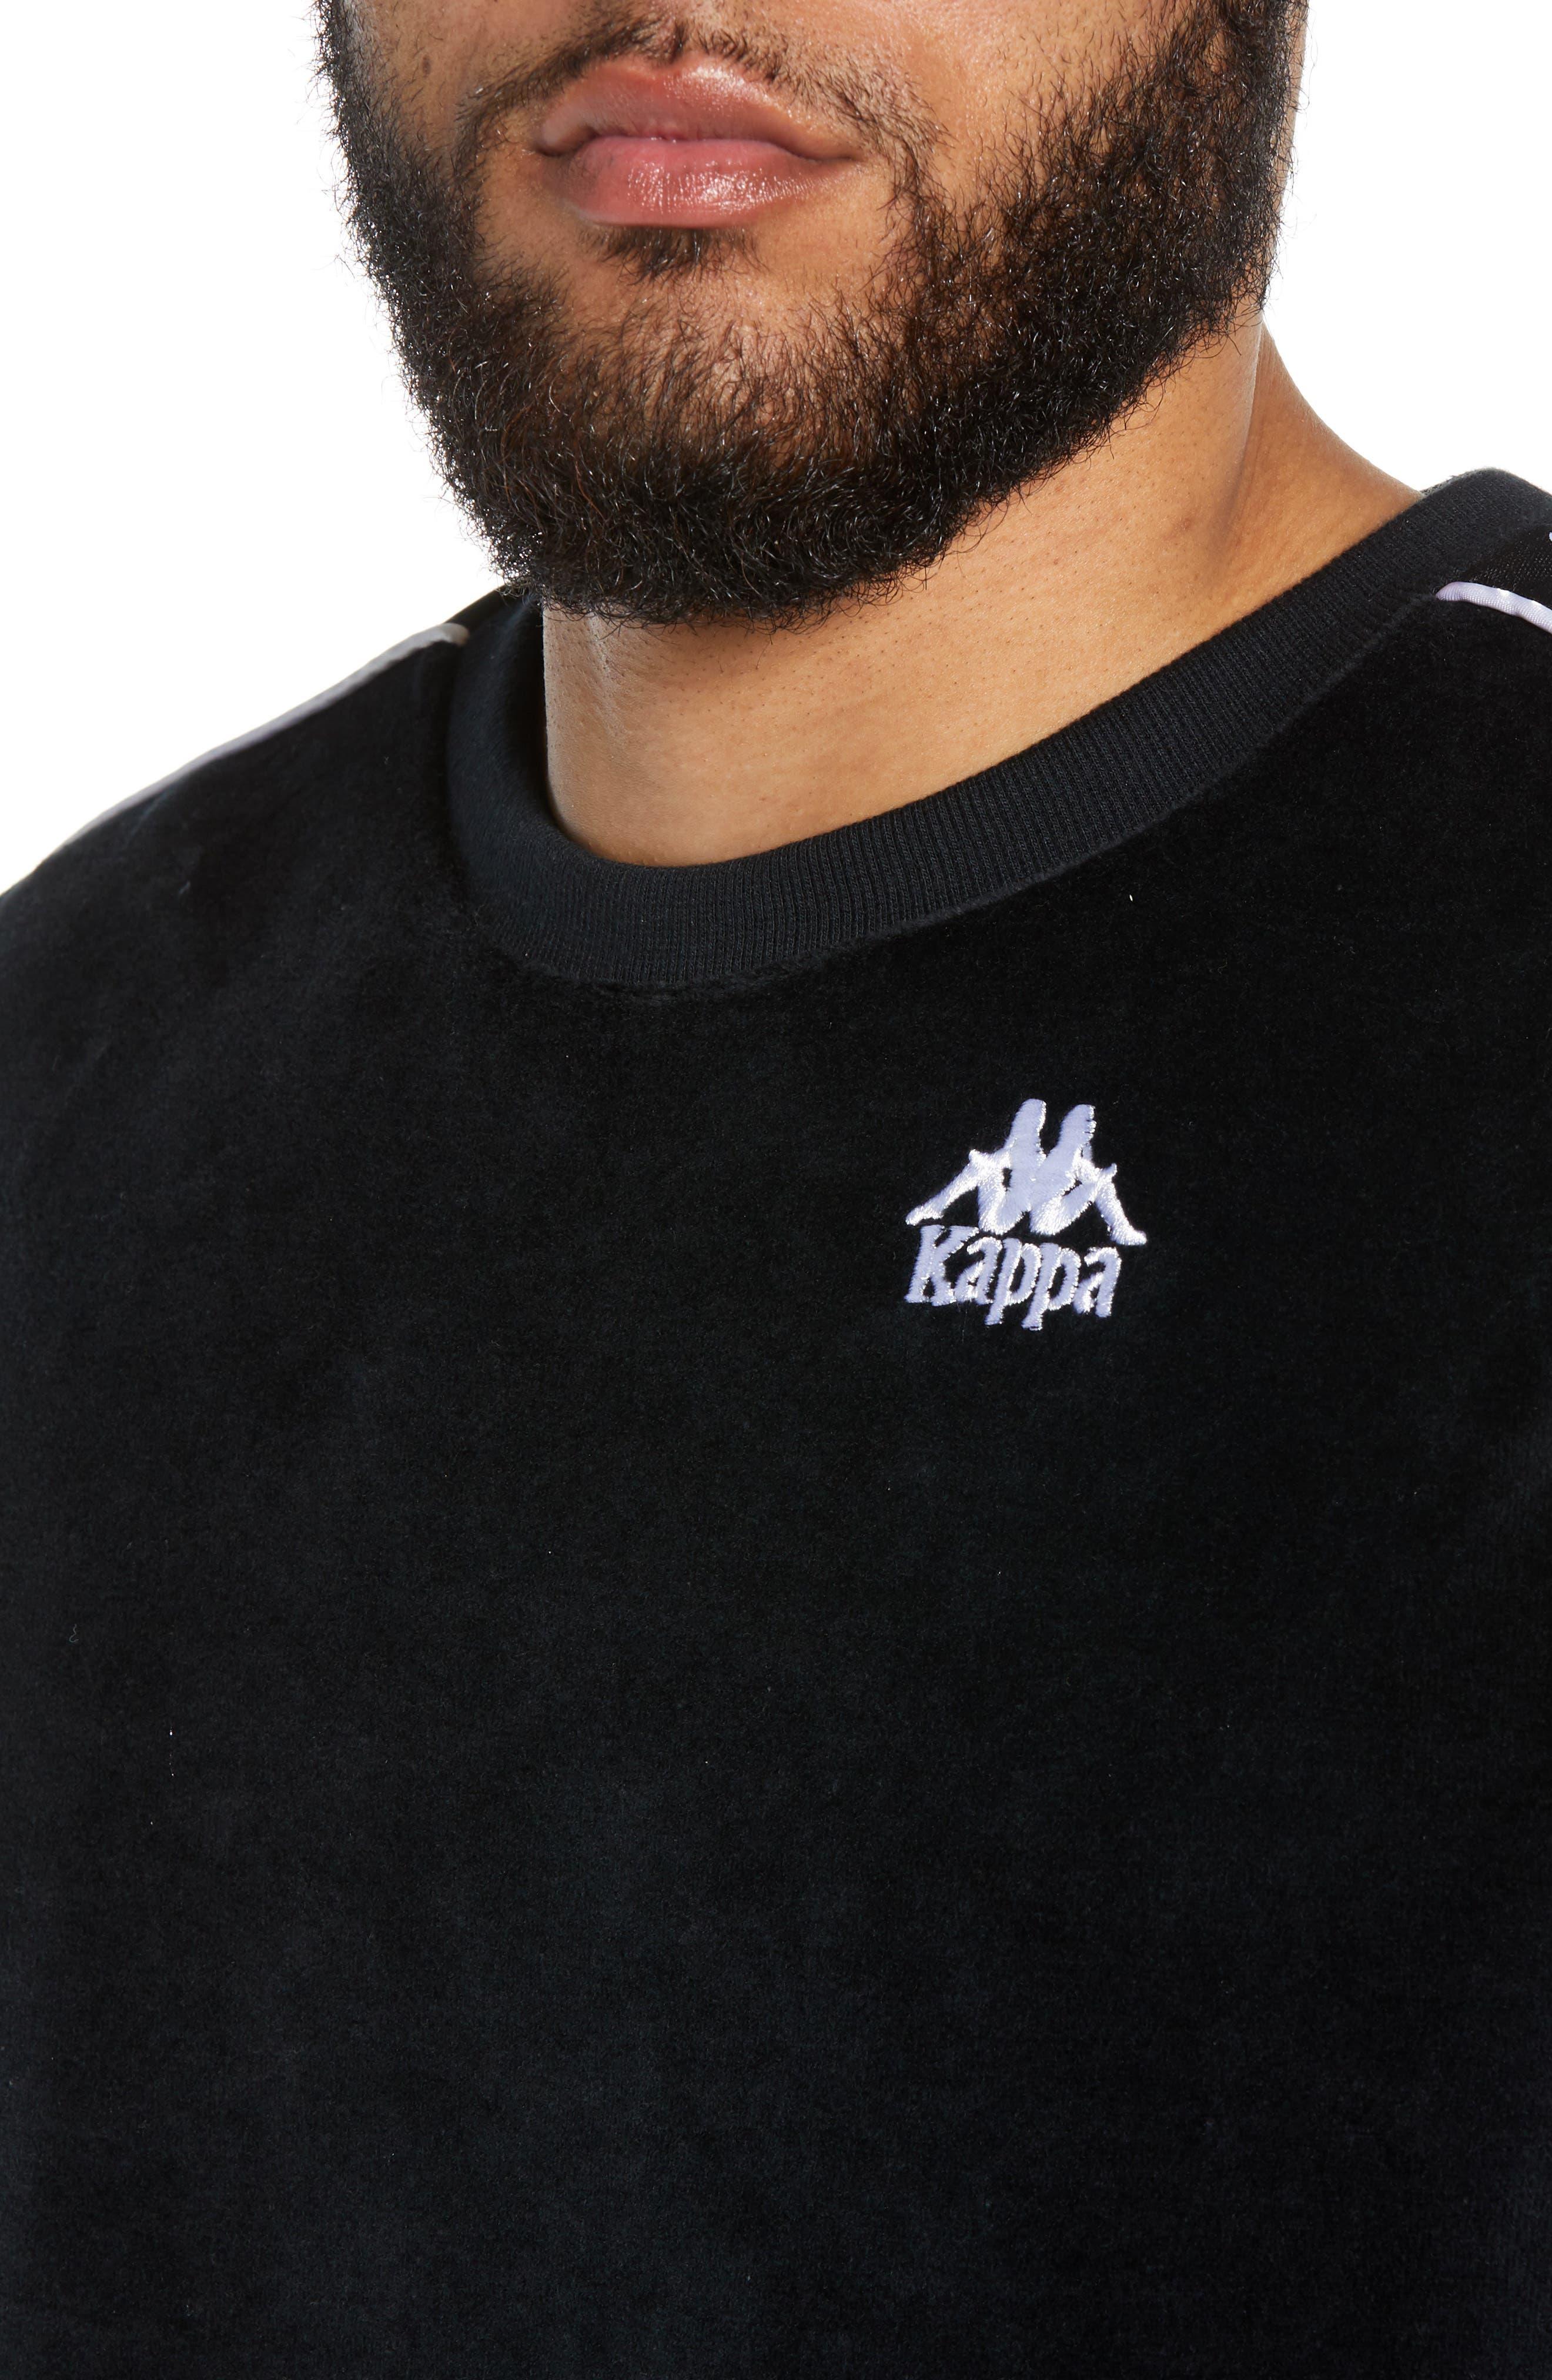 KAPPA,                             Authentic Aynset Velour Crewneck Sweatshirt,                             Alternate thumbnail 4, color,                             001